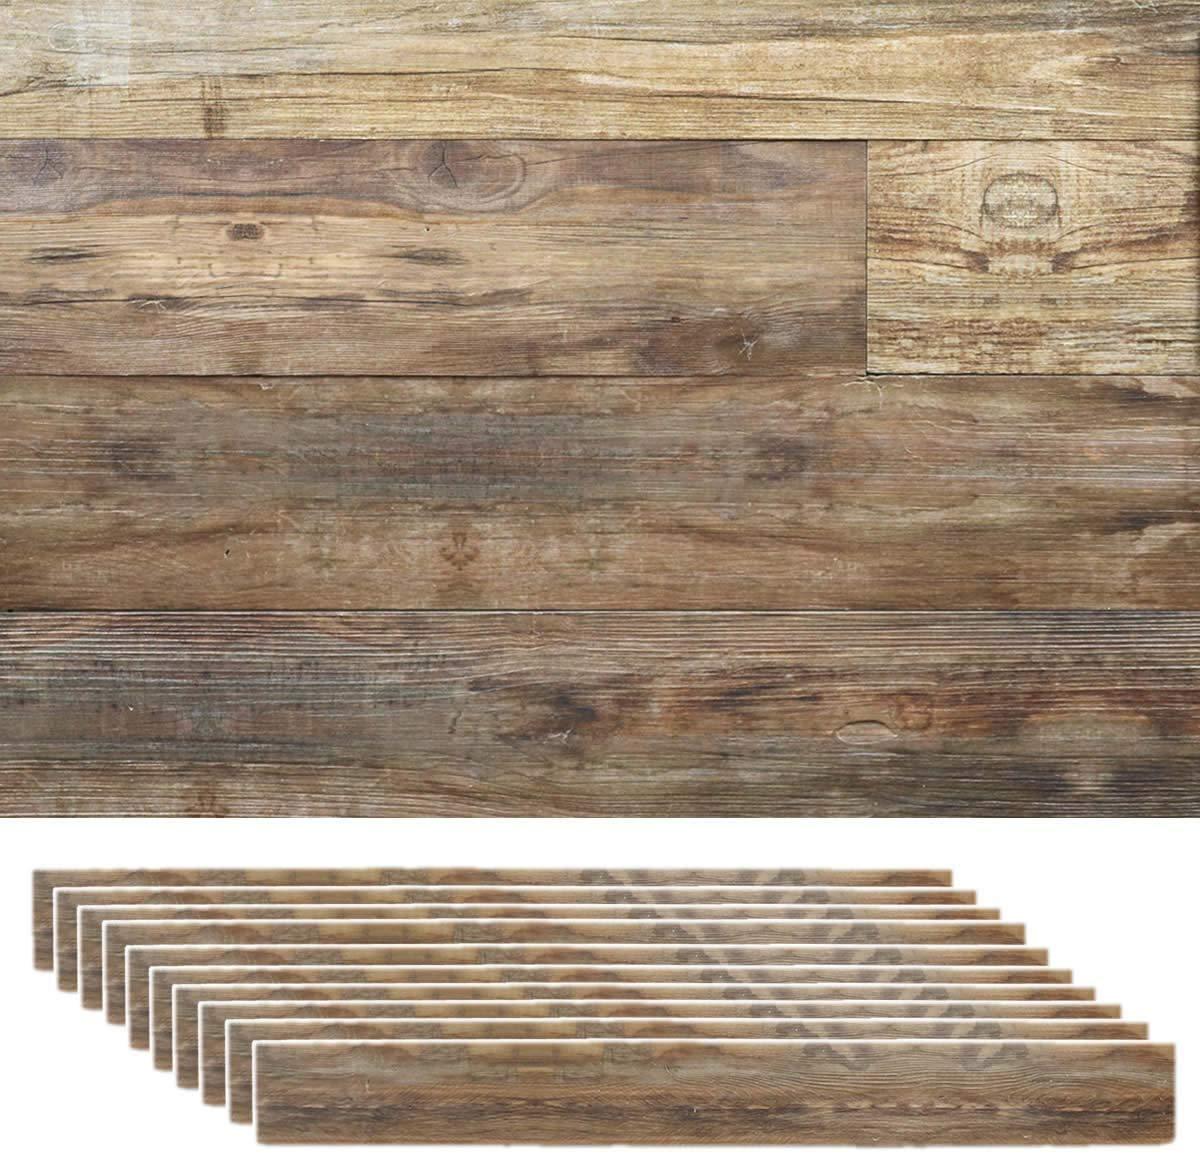 Amazon 壁紙シール 木目 パネル シールタイプ ウッド 壁材 枚組 約3 ブルックリン 壁紙